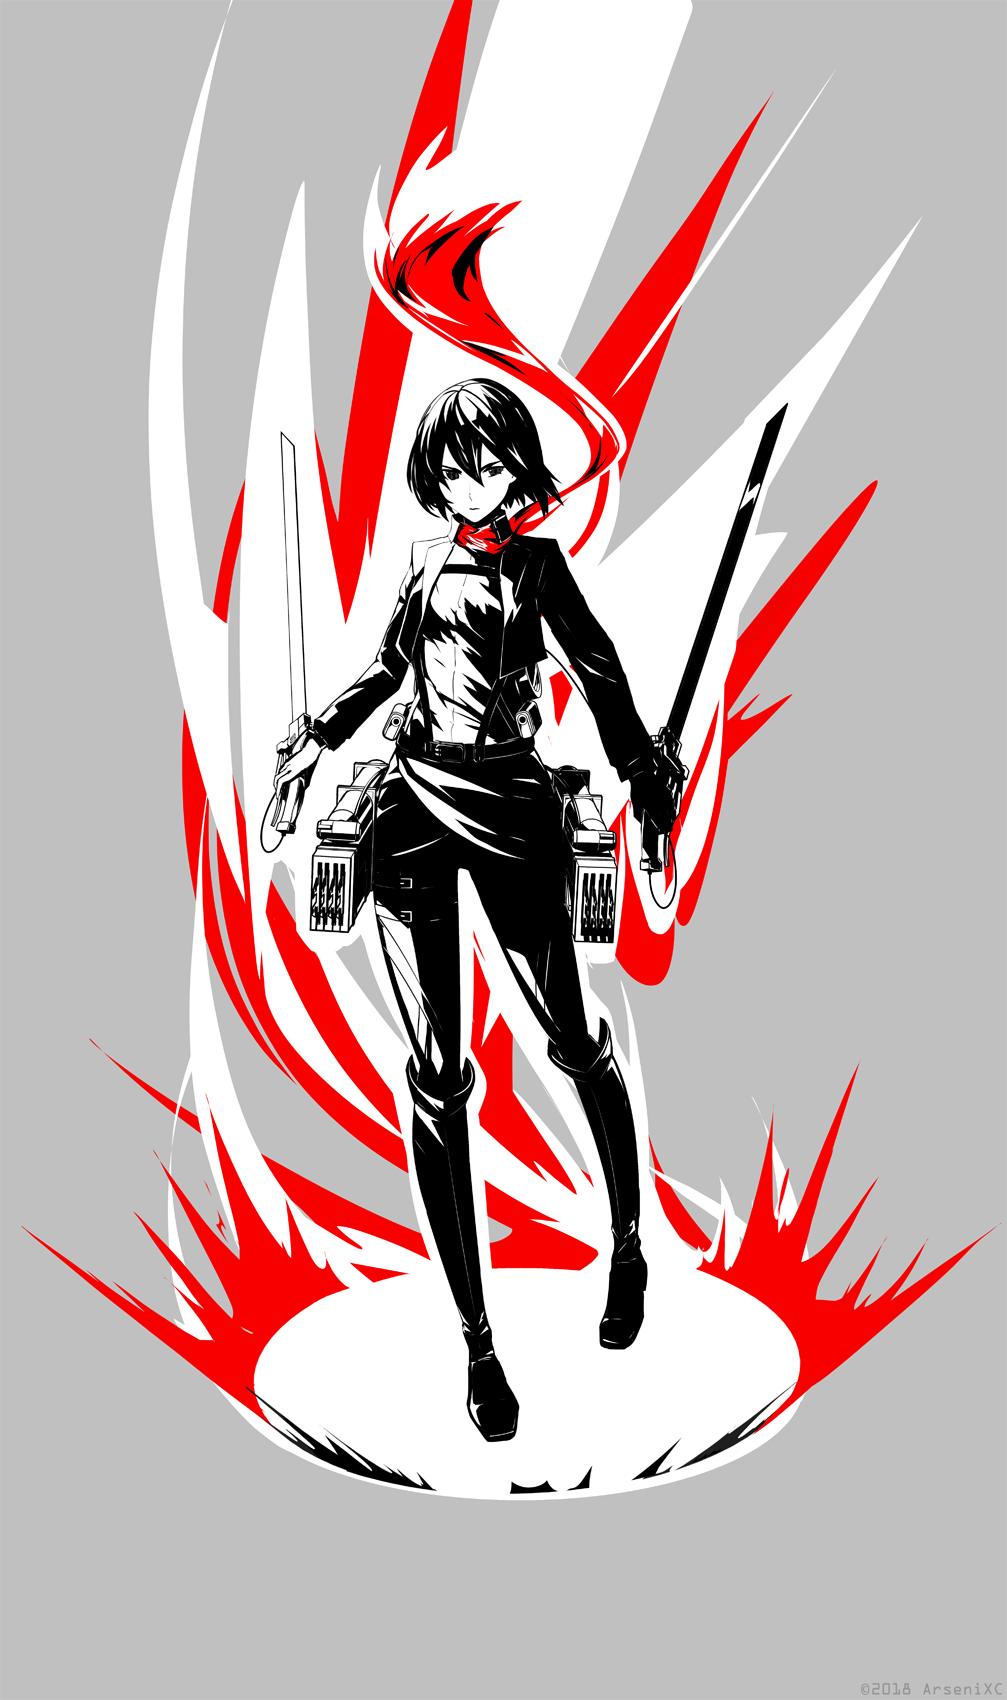 Mikasa Ackerman by arsenixc